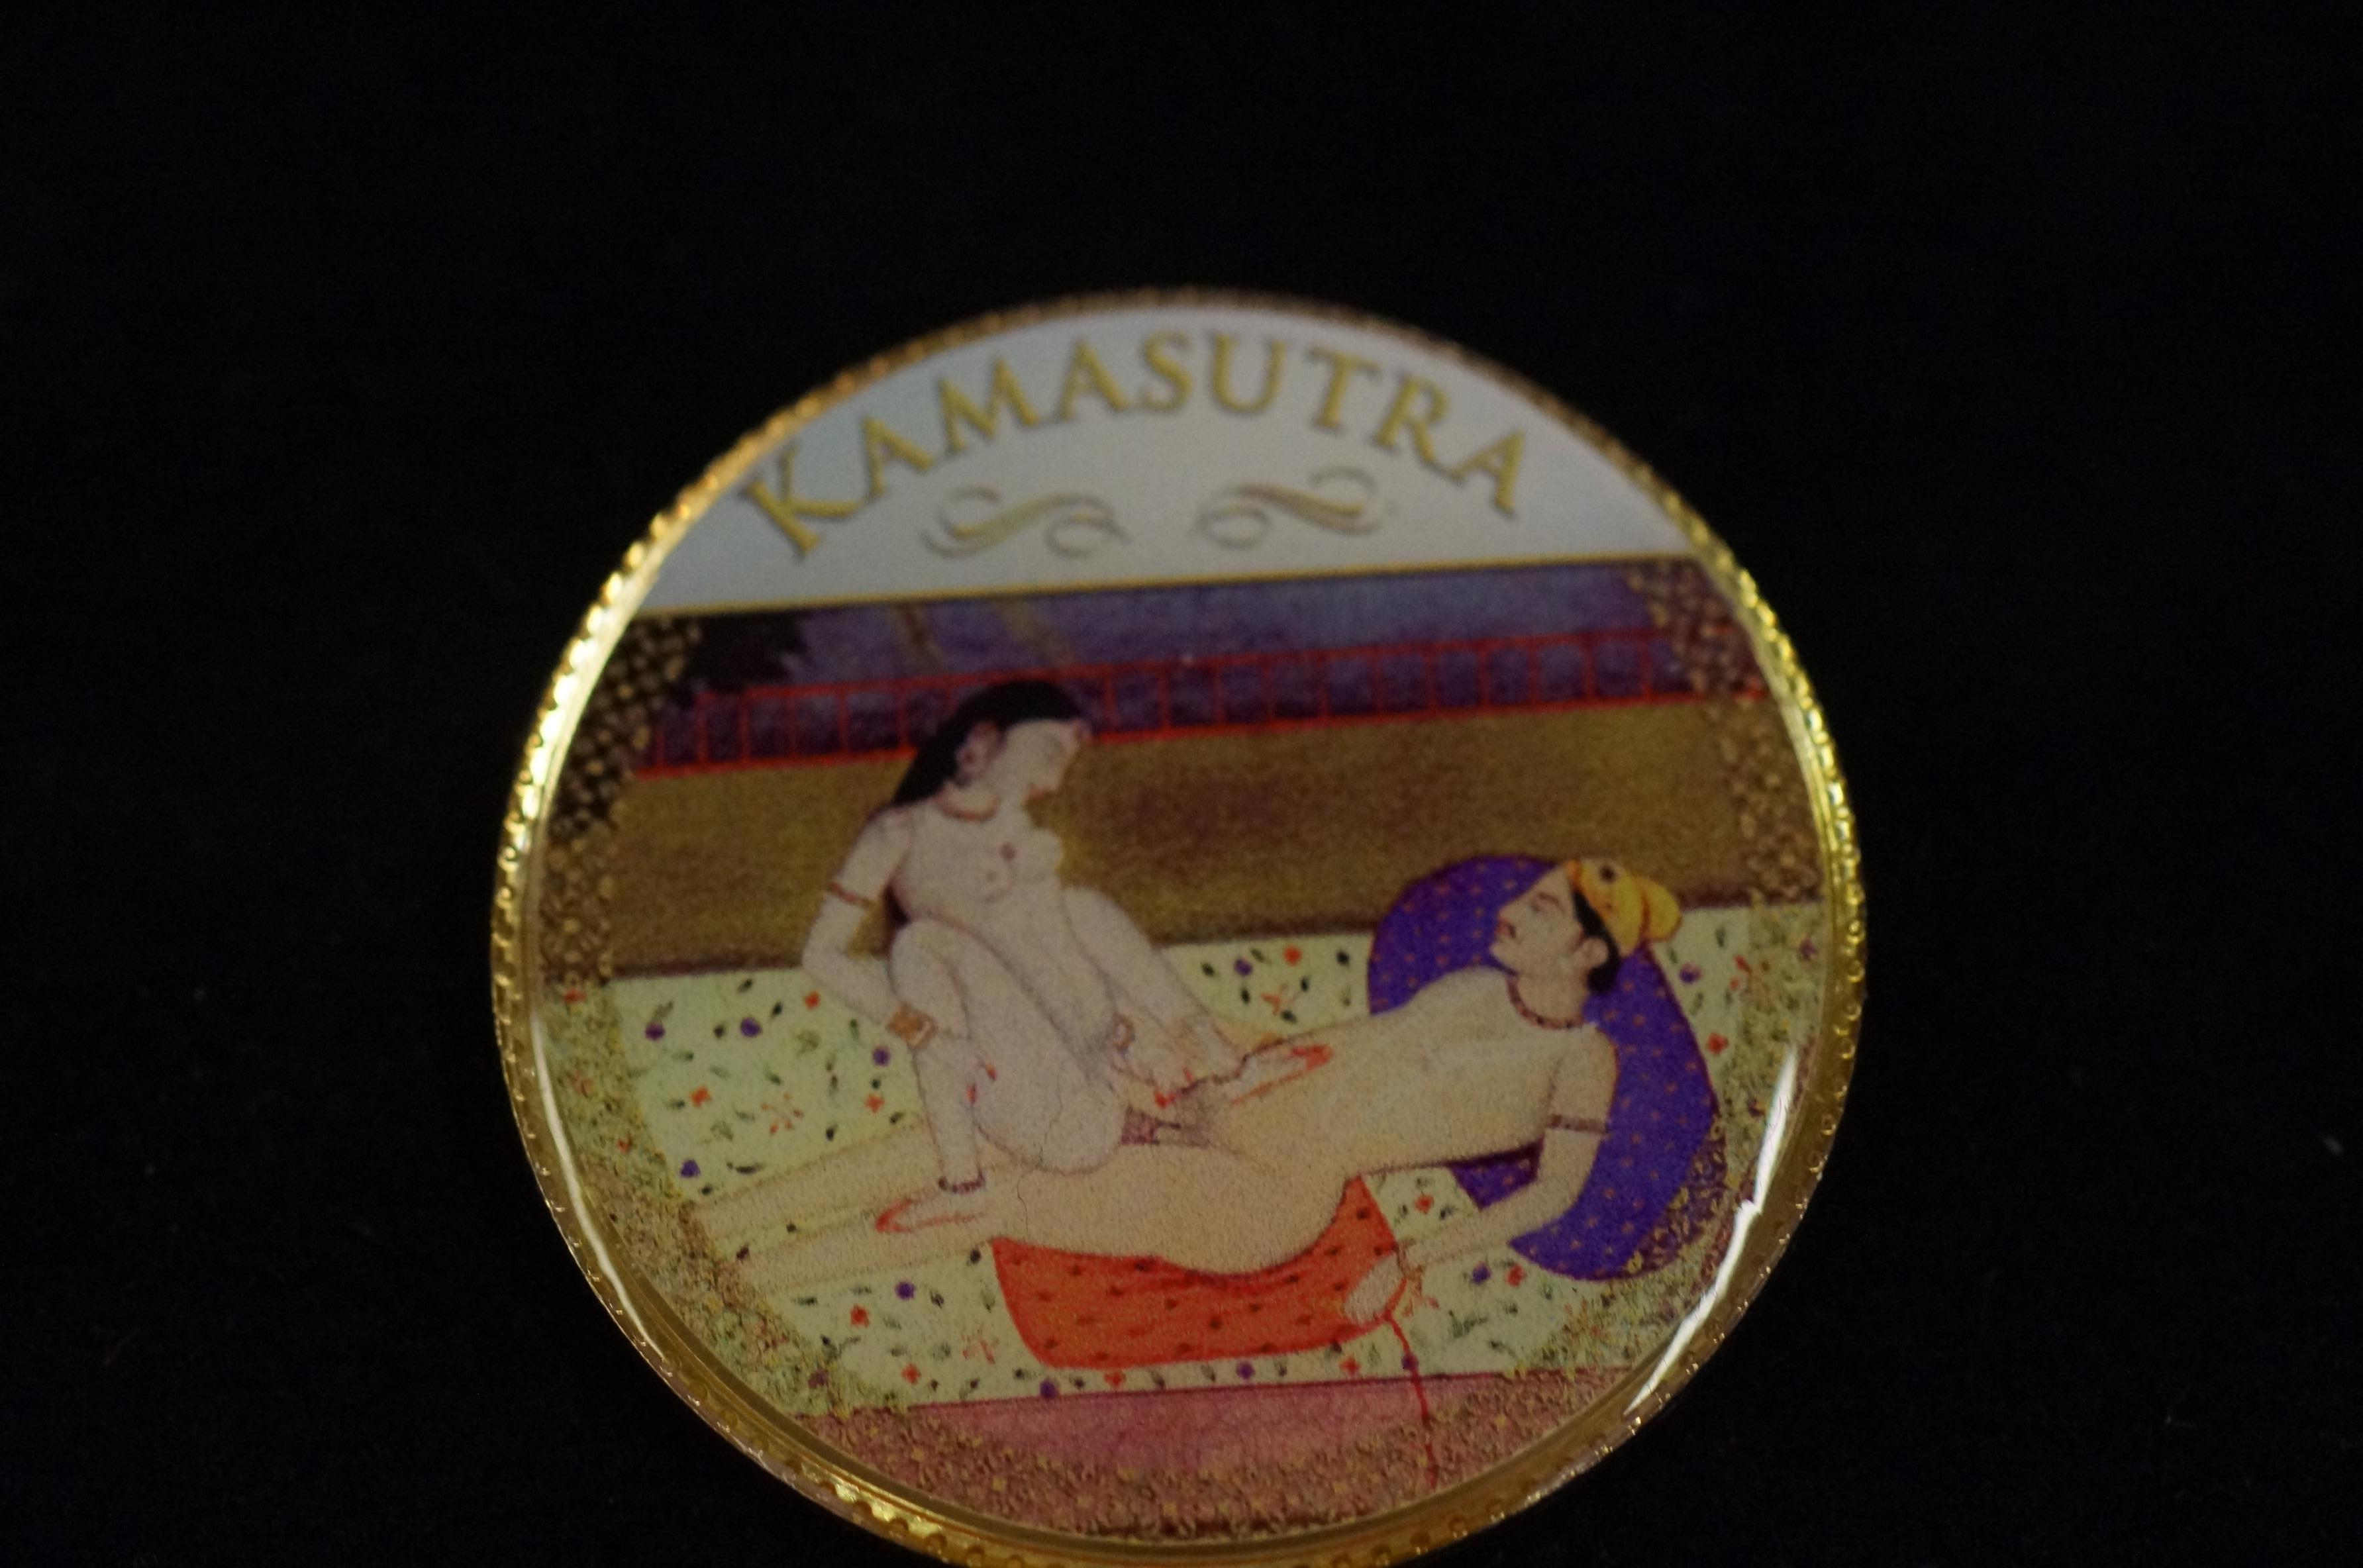 Kamasutra medallion - Image 2 of 2